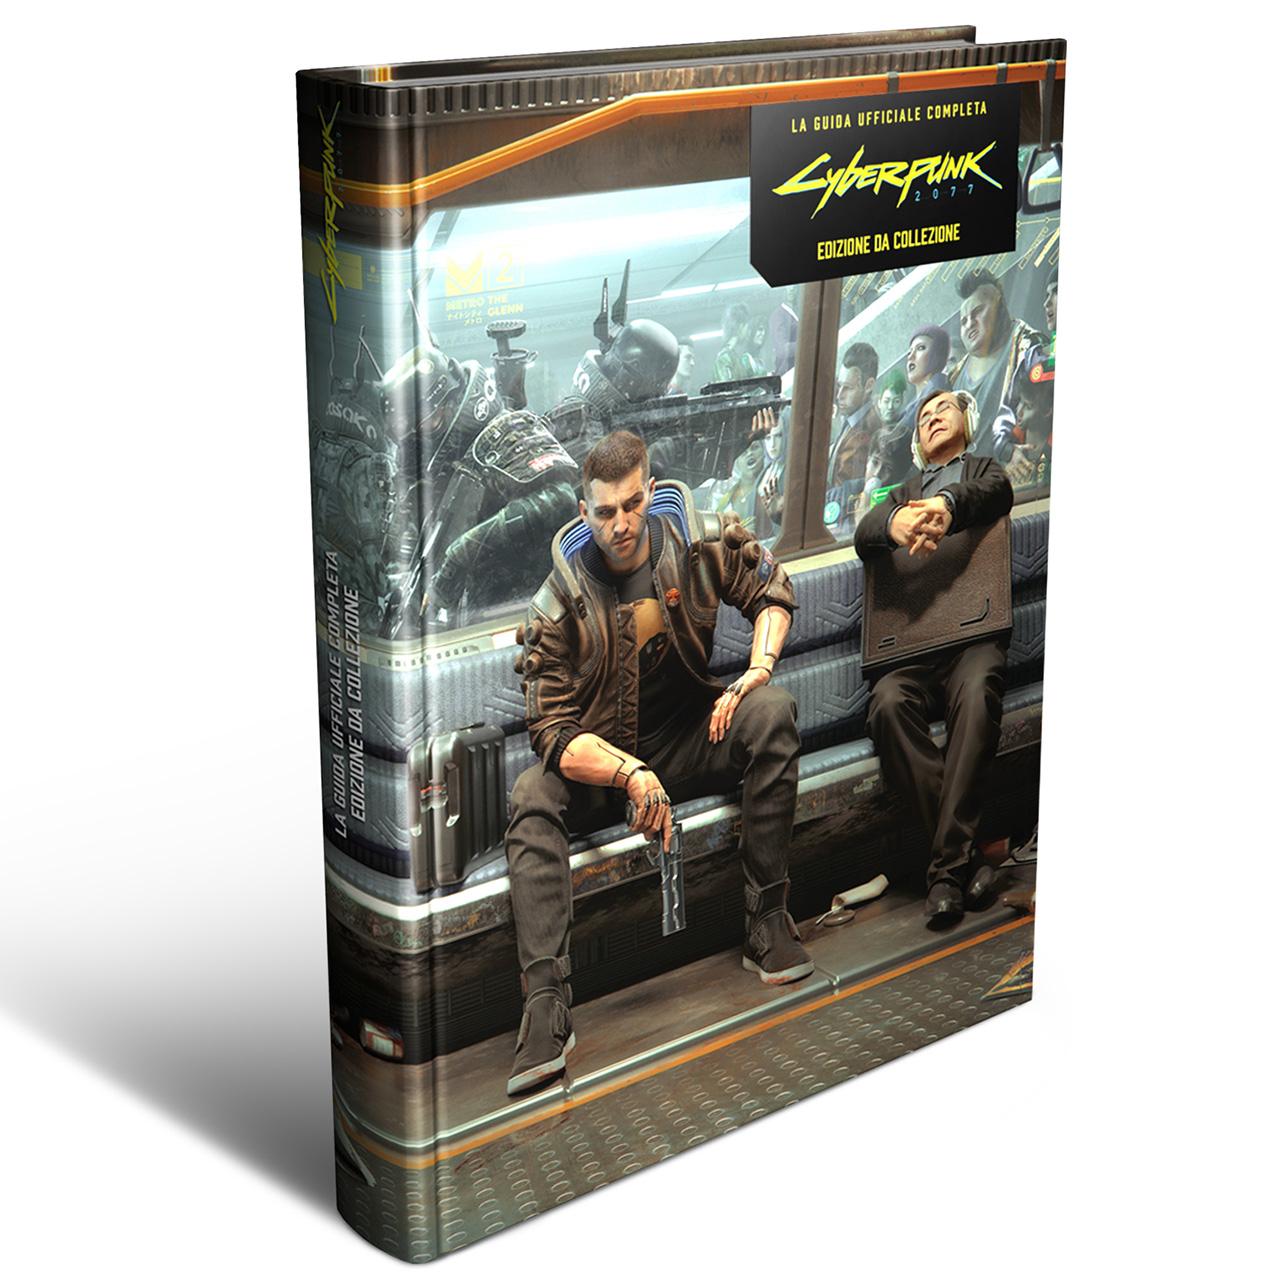 cyberpunk 2077 guida ufficiale Collector's